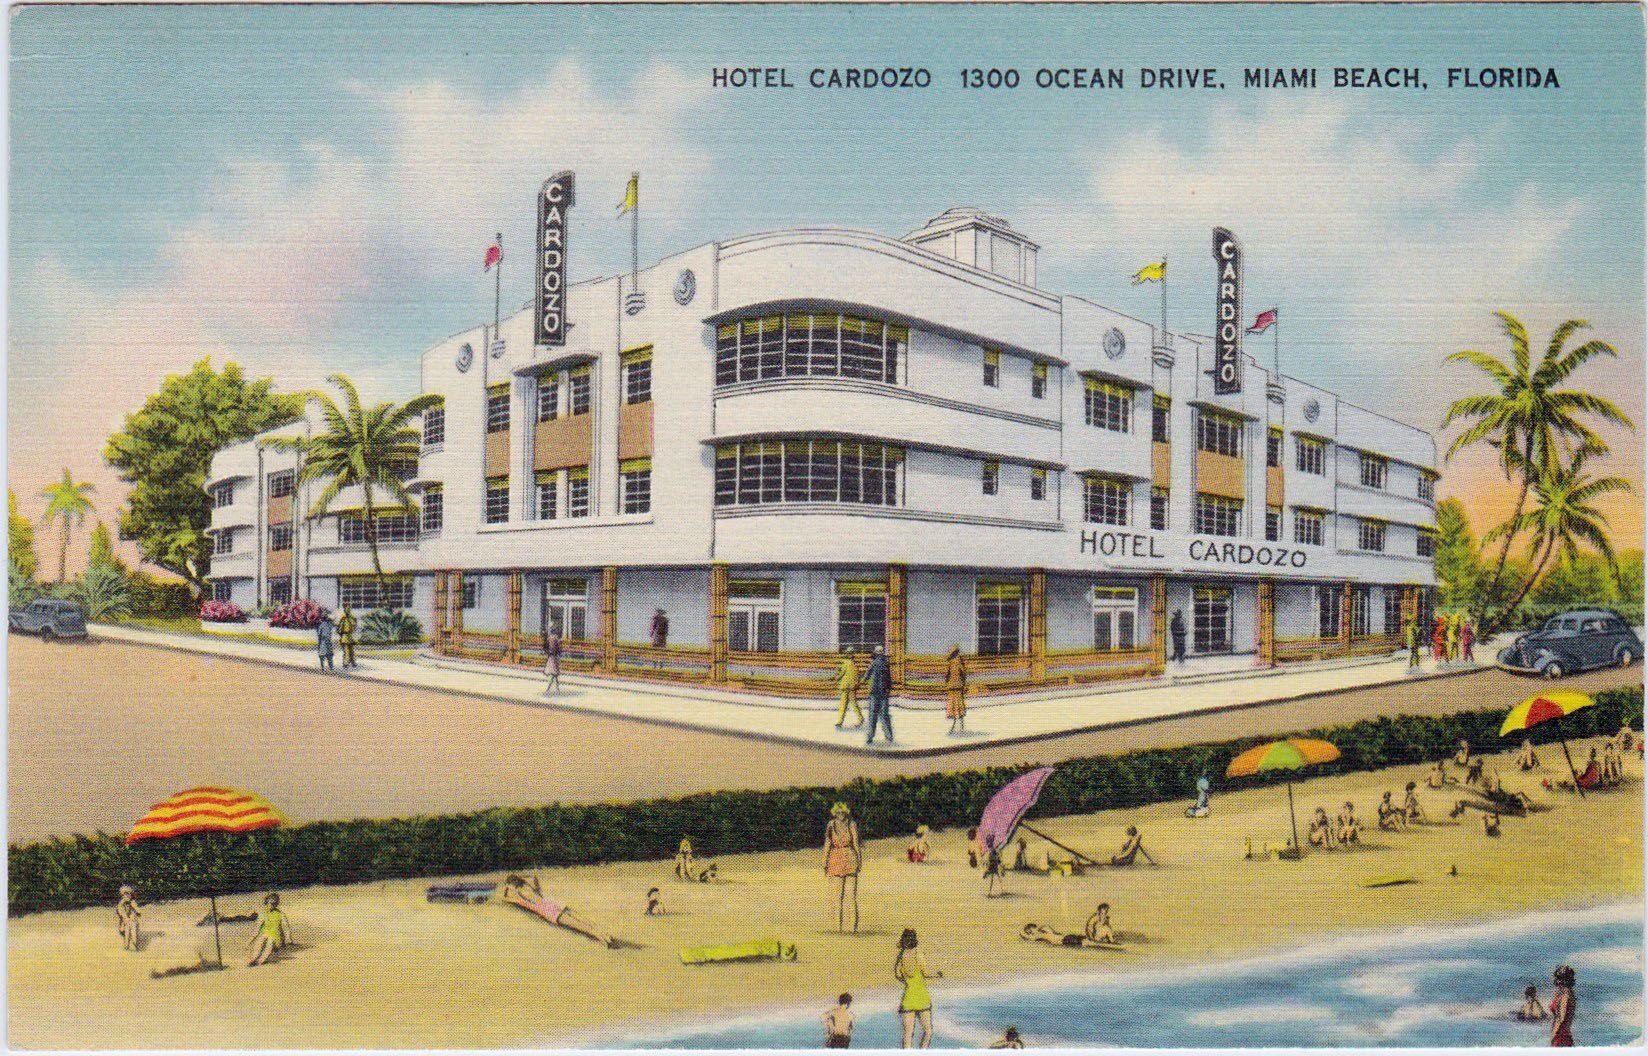 Cardozo Hotel 1300 Ocean Drive Ca 1930 S 1940 Accent On Service